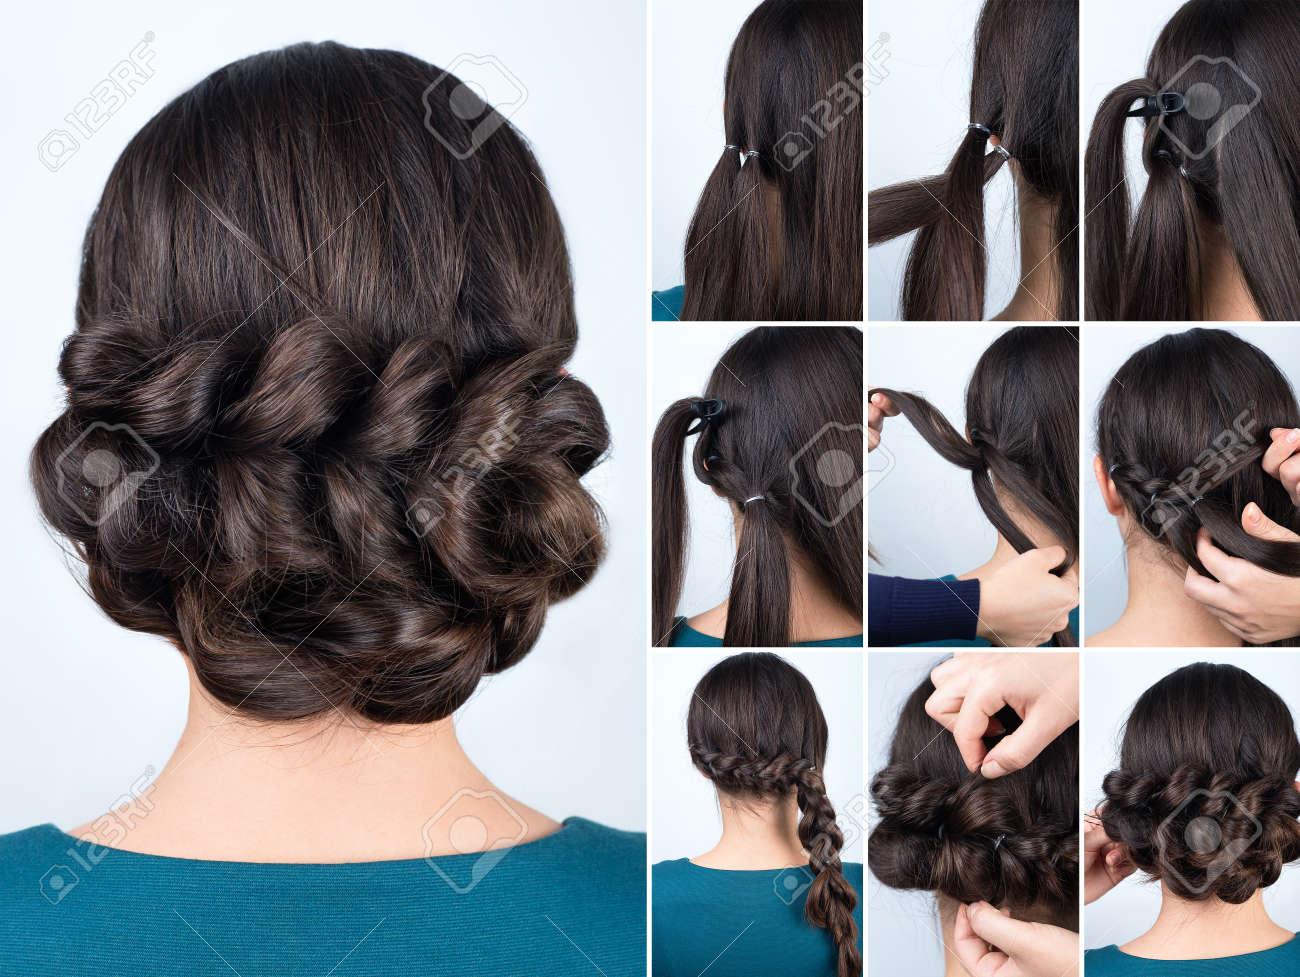 Hair tutorial. Hairstyle volume braids tutorial. Backstage technique..